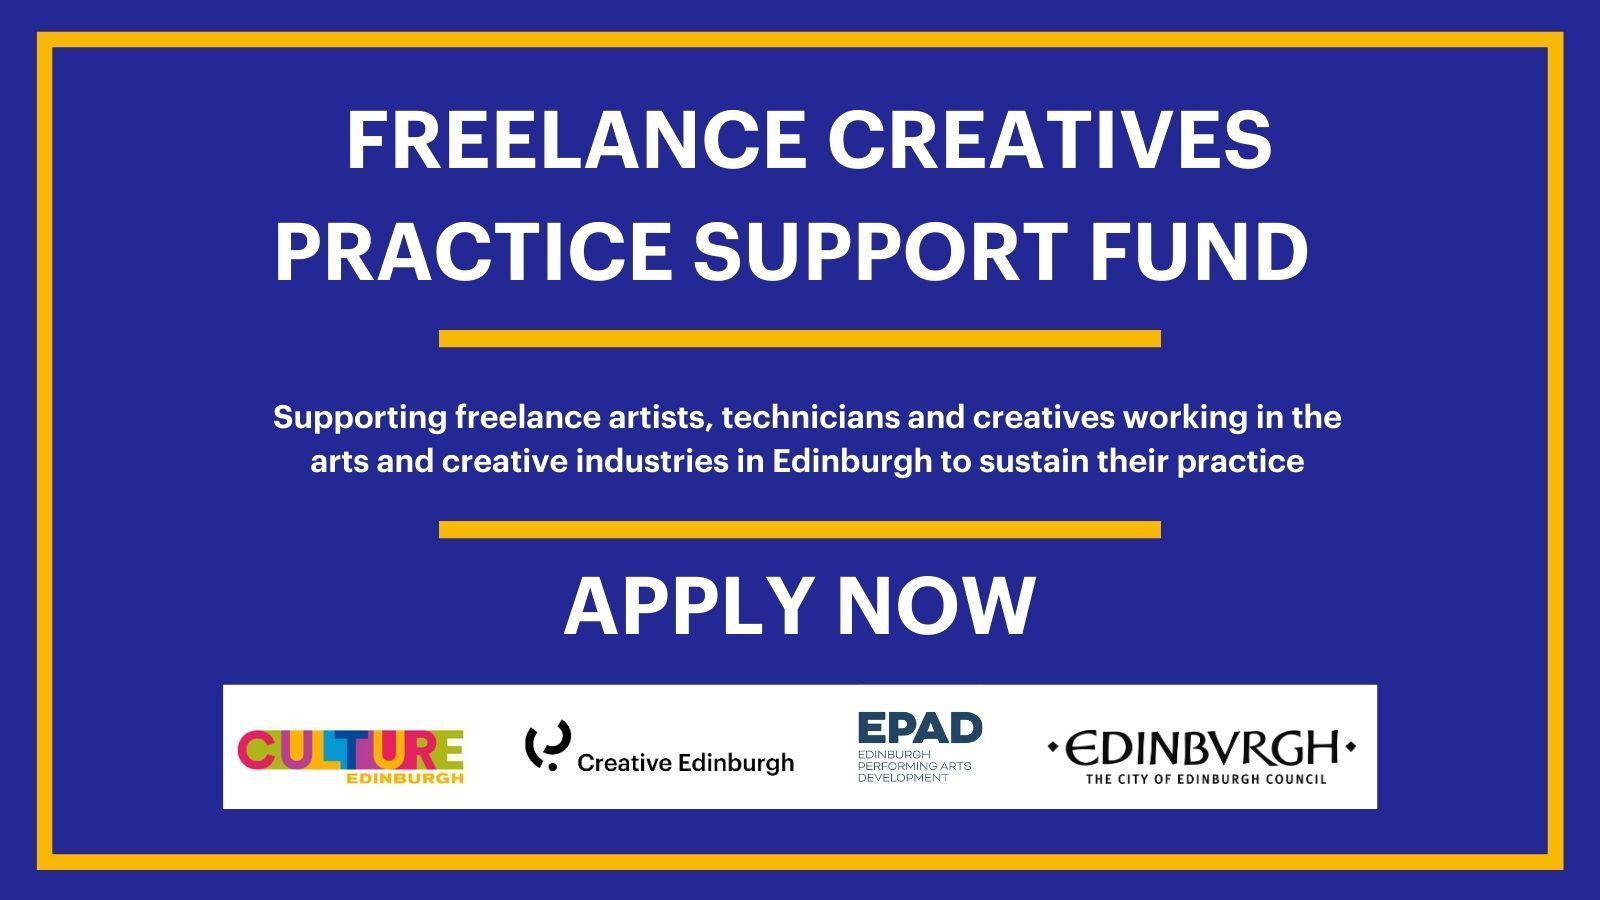 EPAD & Creative Edinburgh Freelance Creatives Practice Support Fund